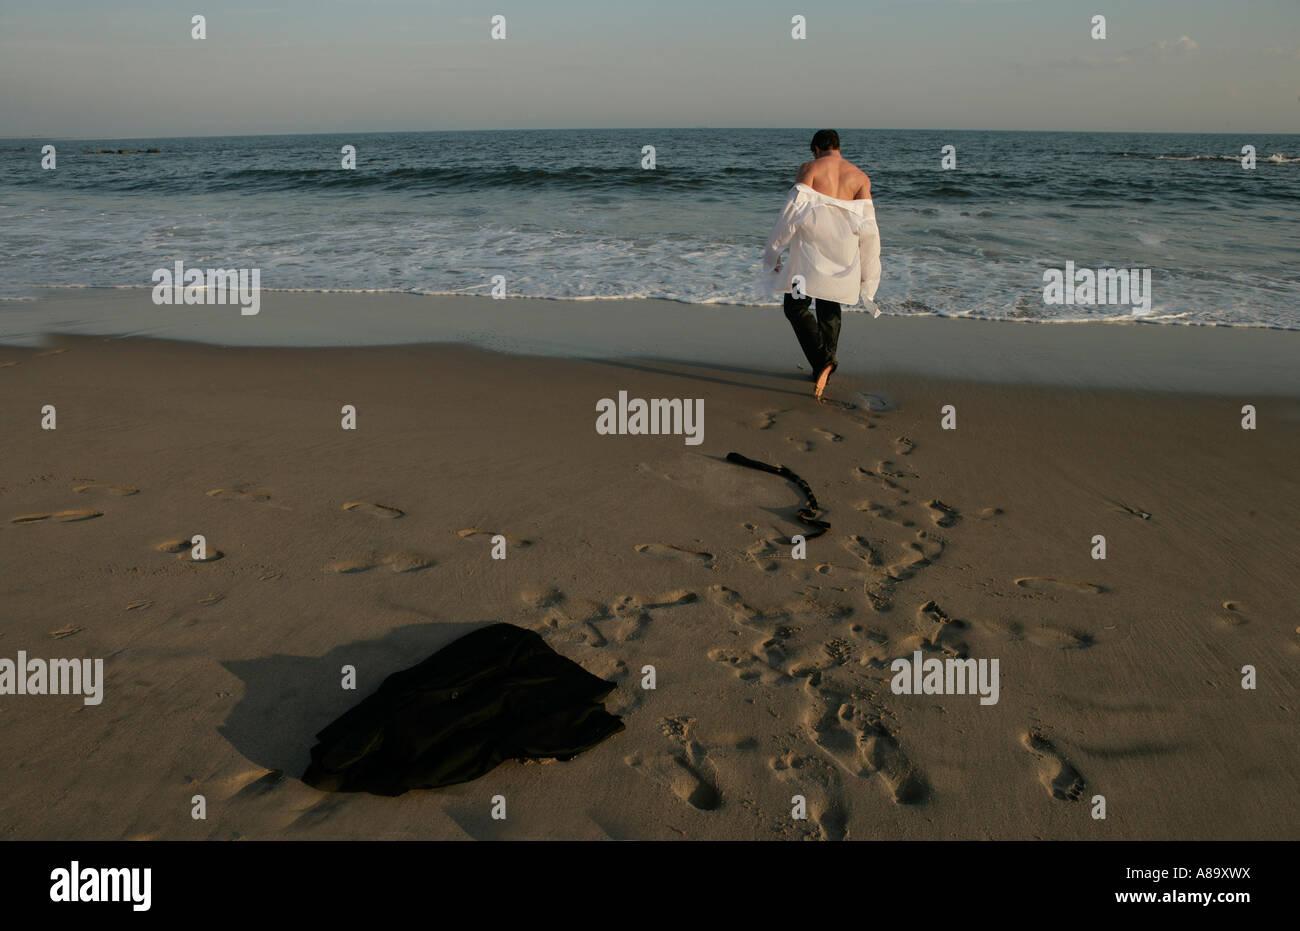 Man walking out to sea - Stock Image